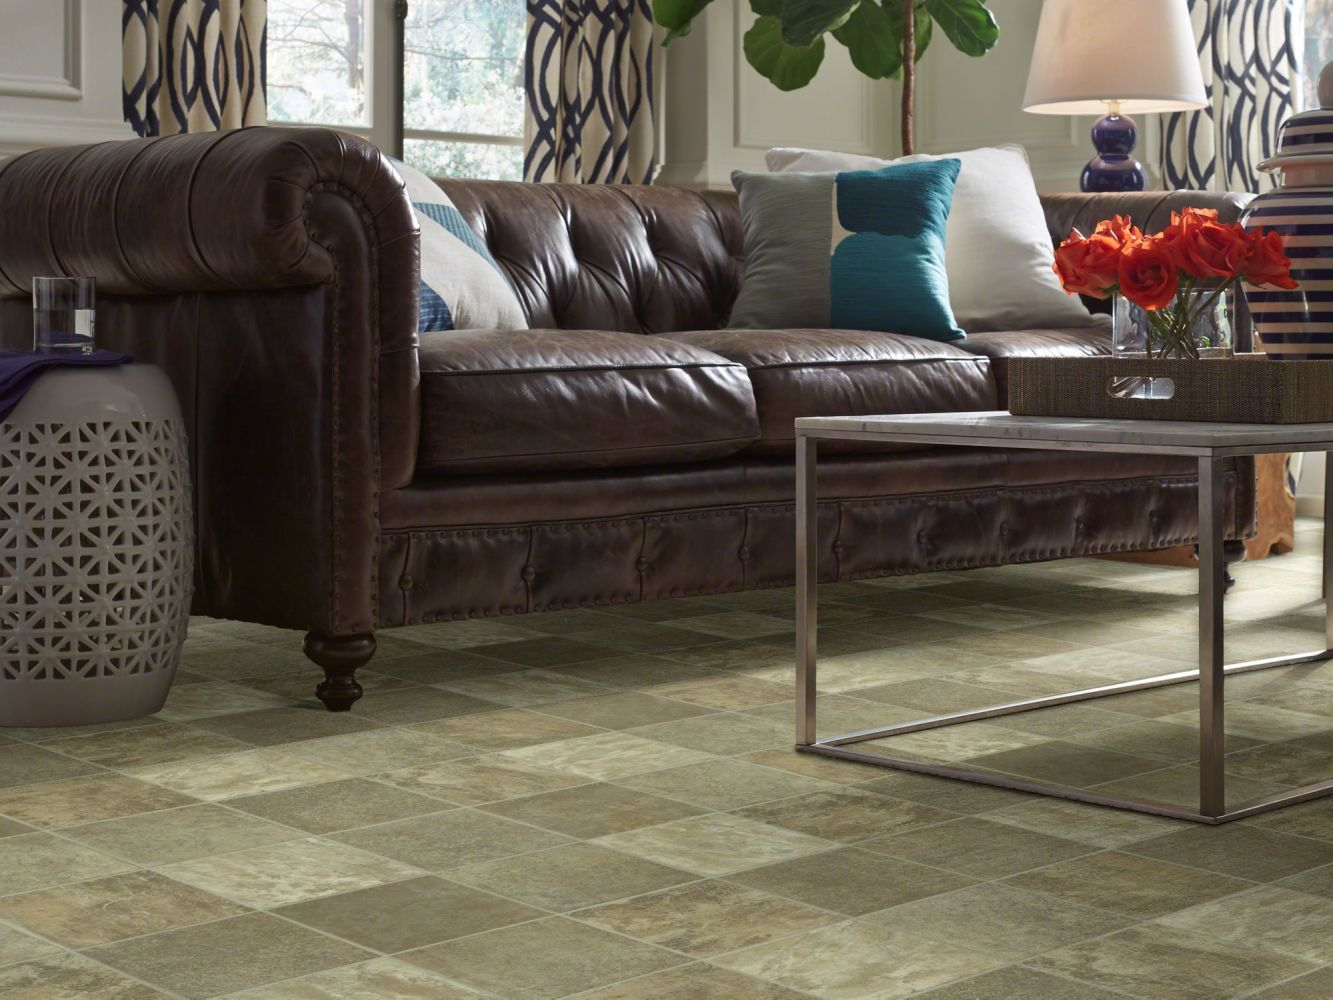 Shaw Floors Resilient Residential Adirondack 12c Tacoma 00120_SA623